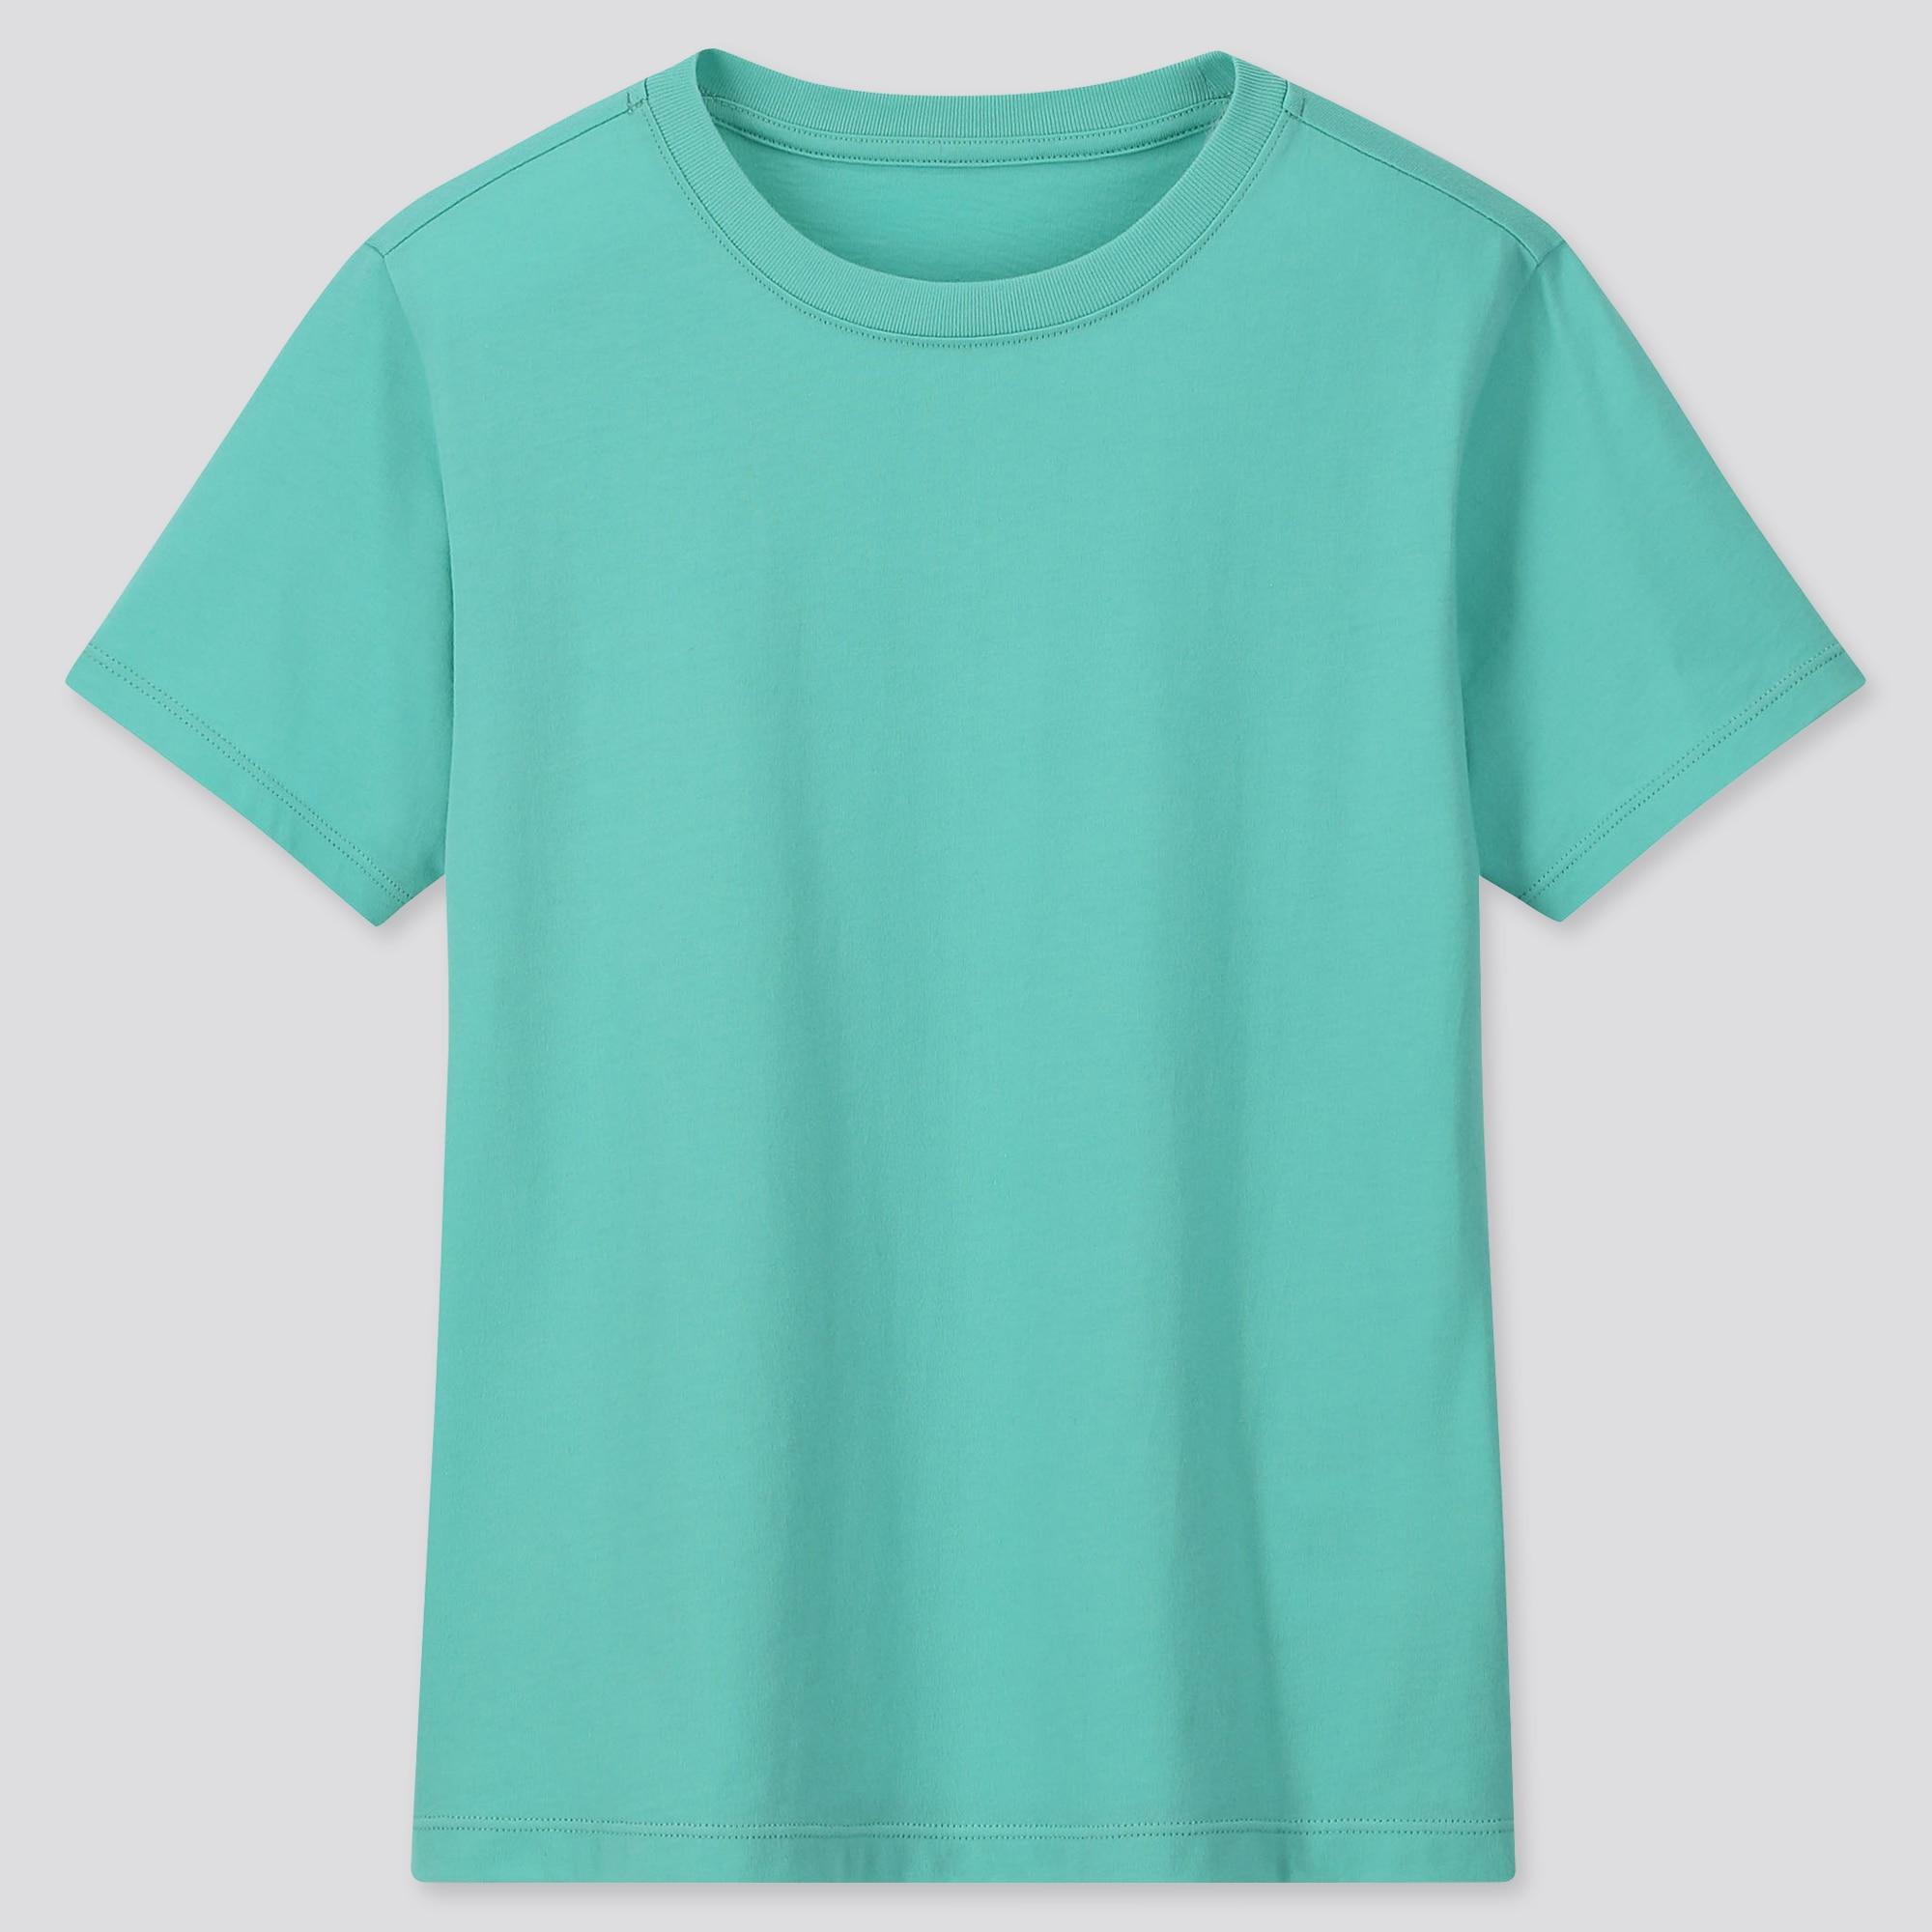 Kids Cotton Colour Crew Neck Short Sleeved T-Shirt